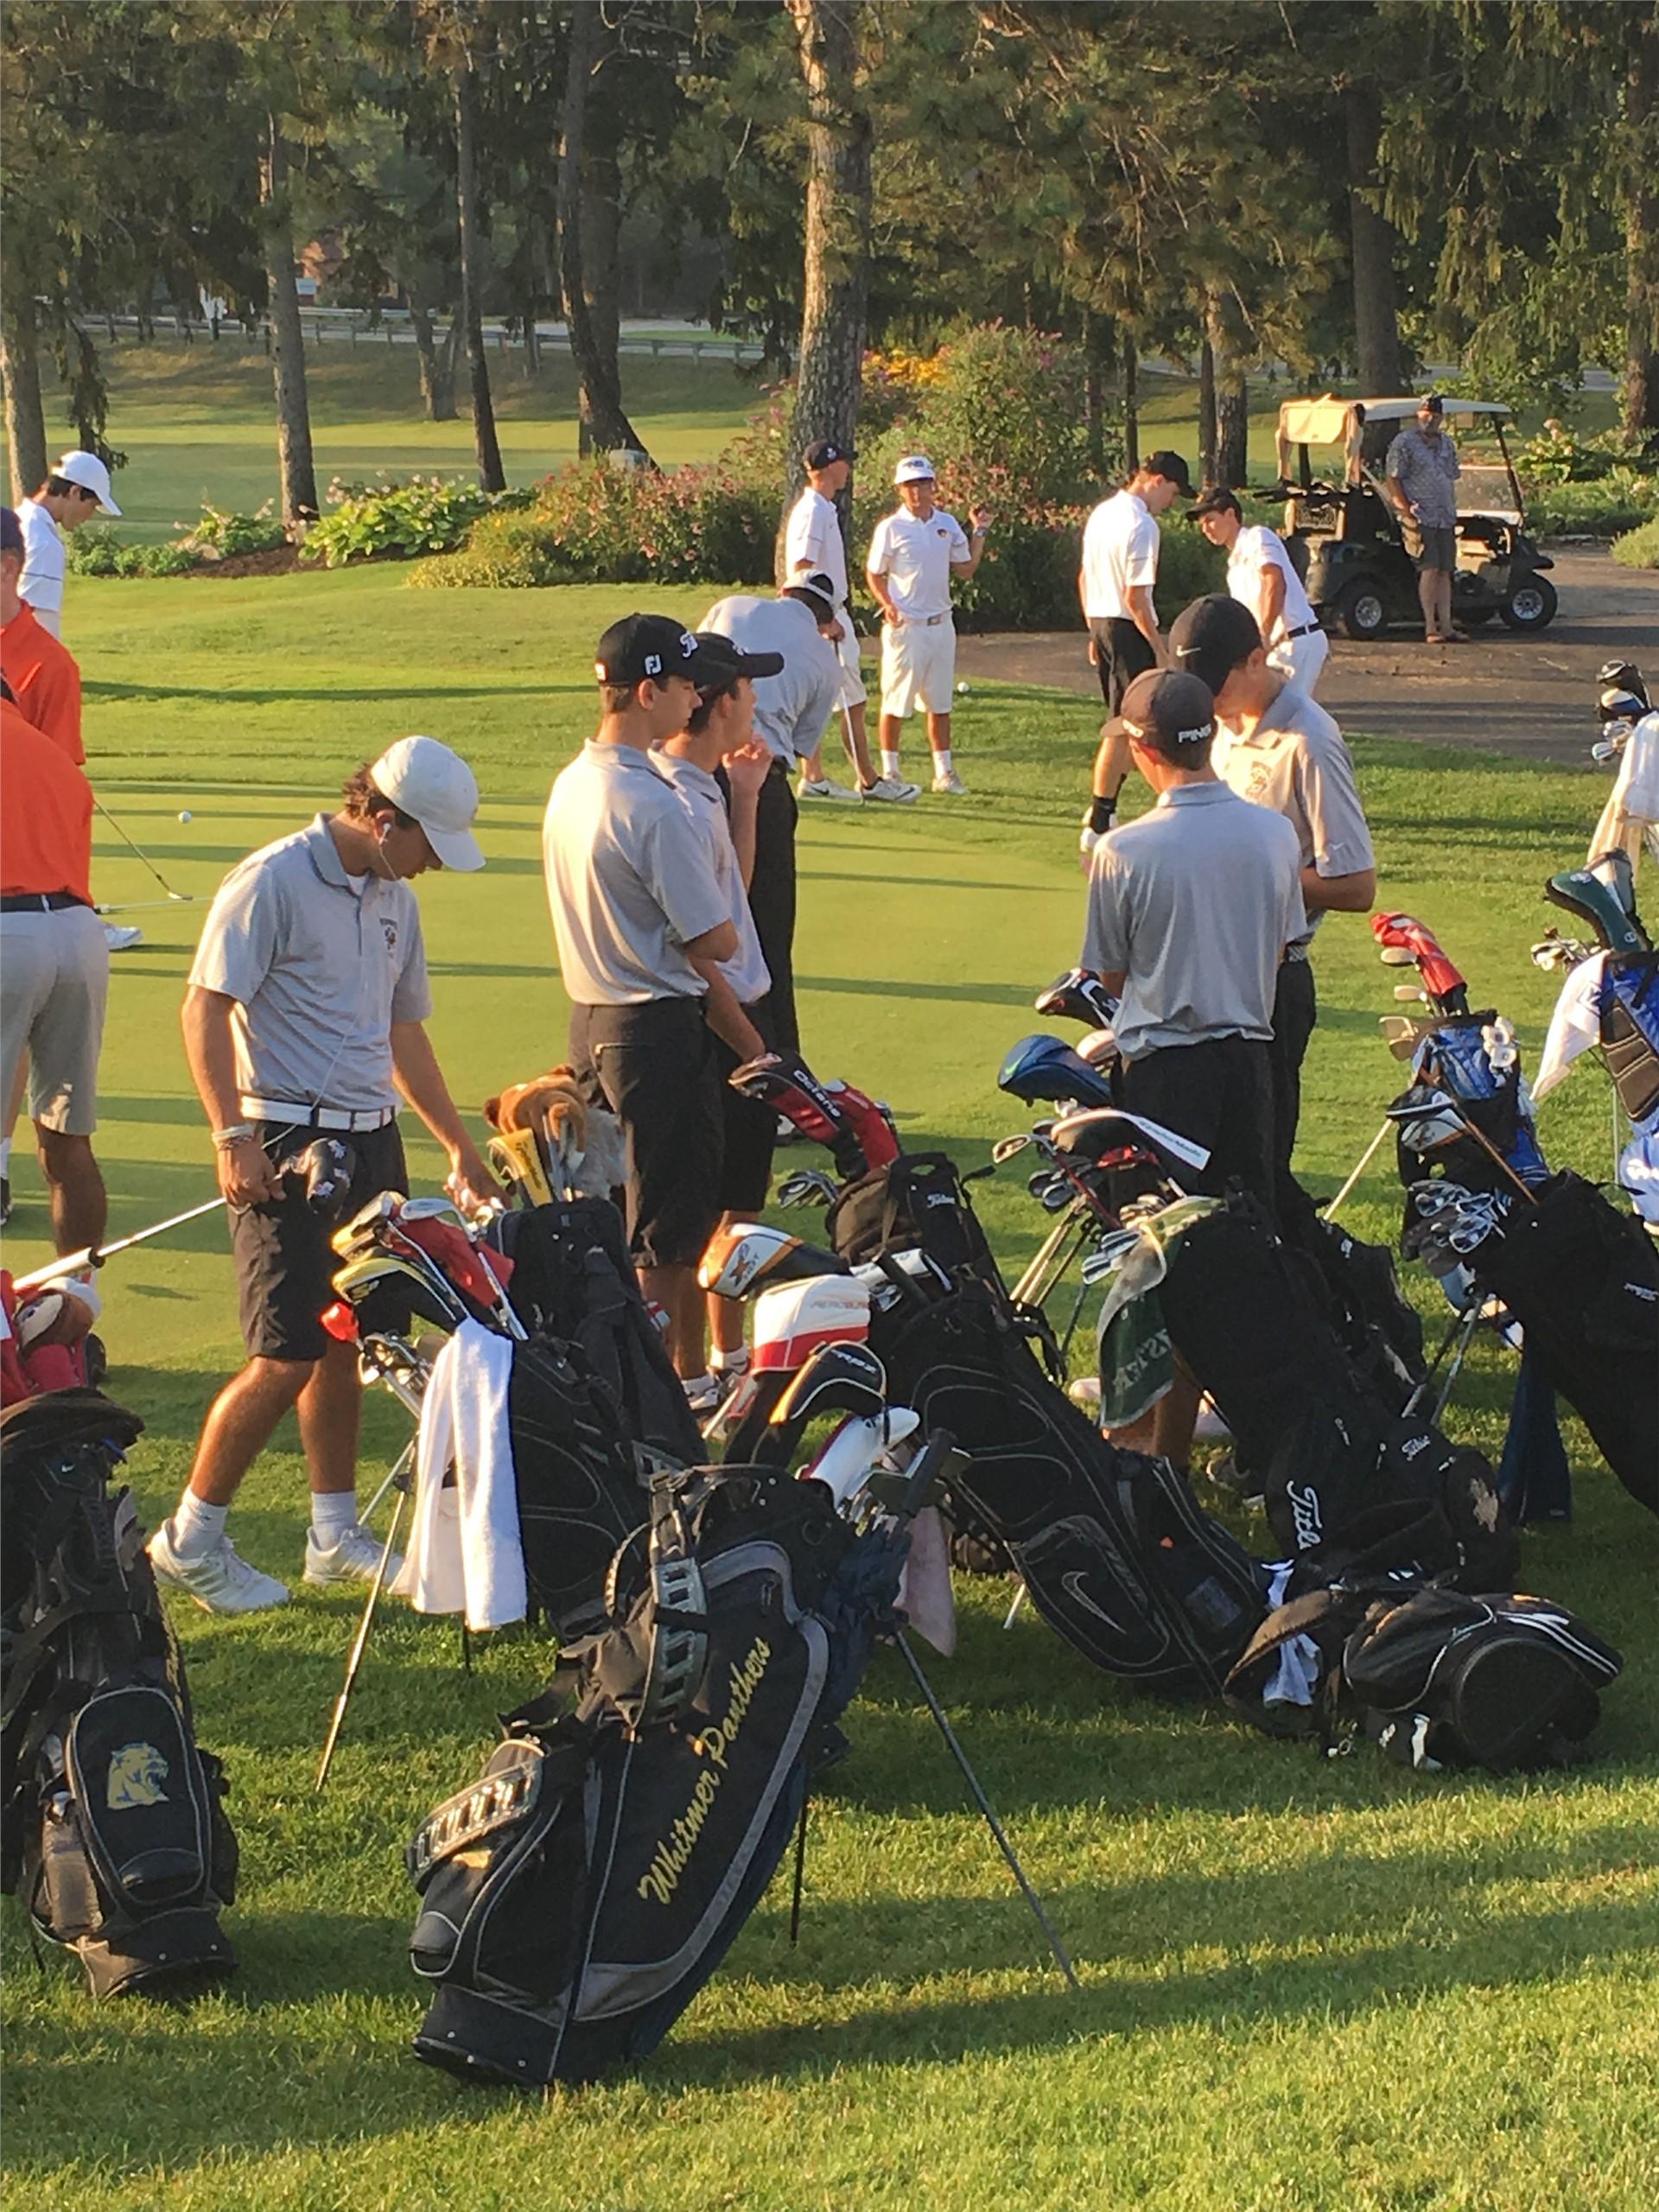 PHS boys golf team preparing for the match